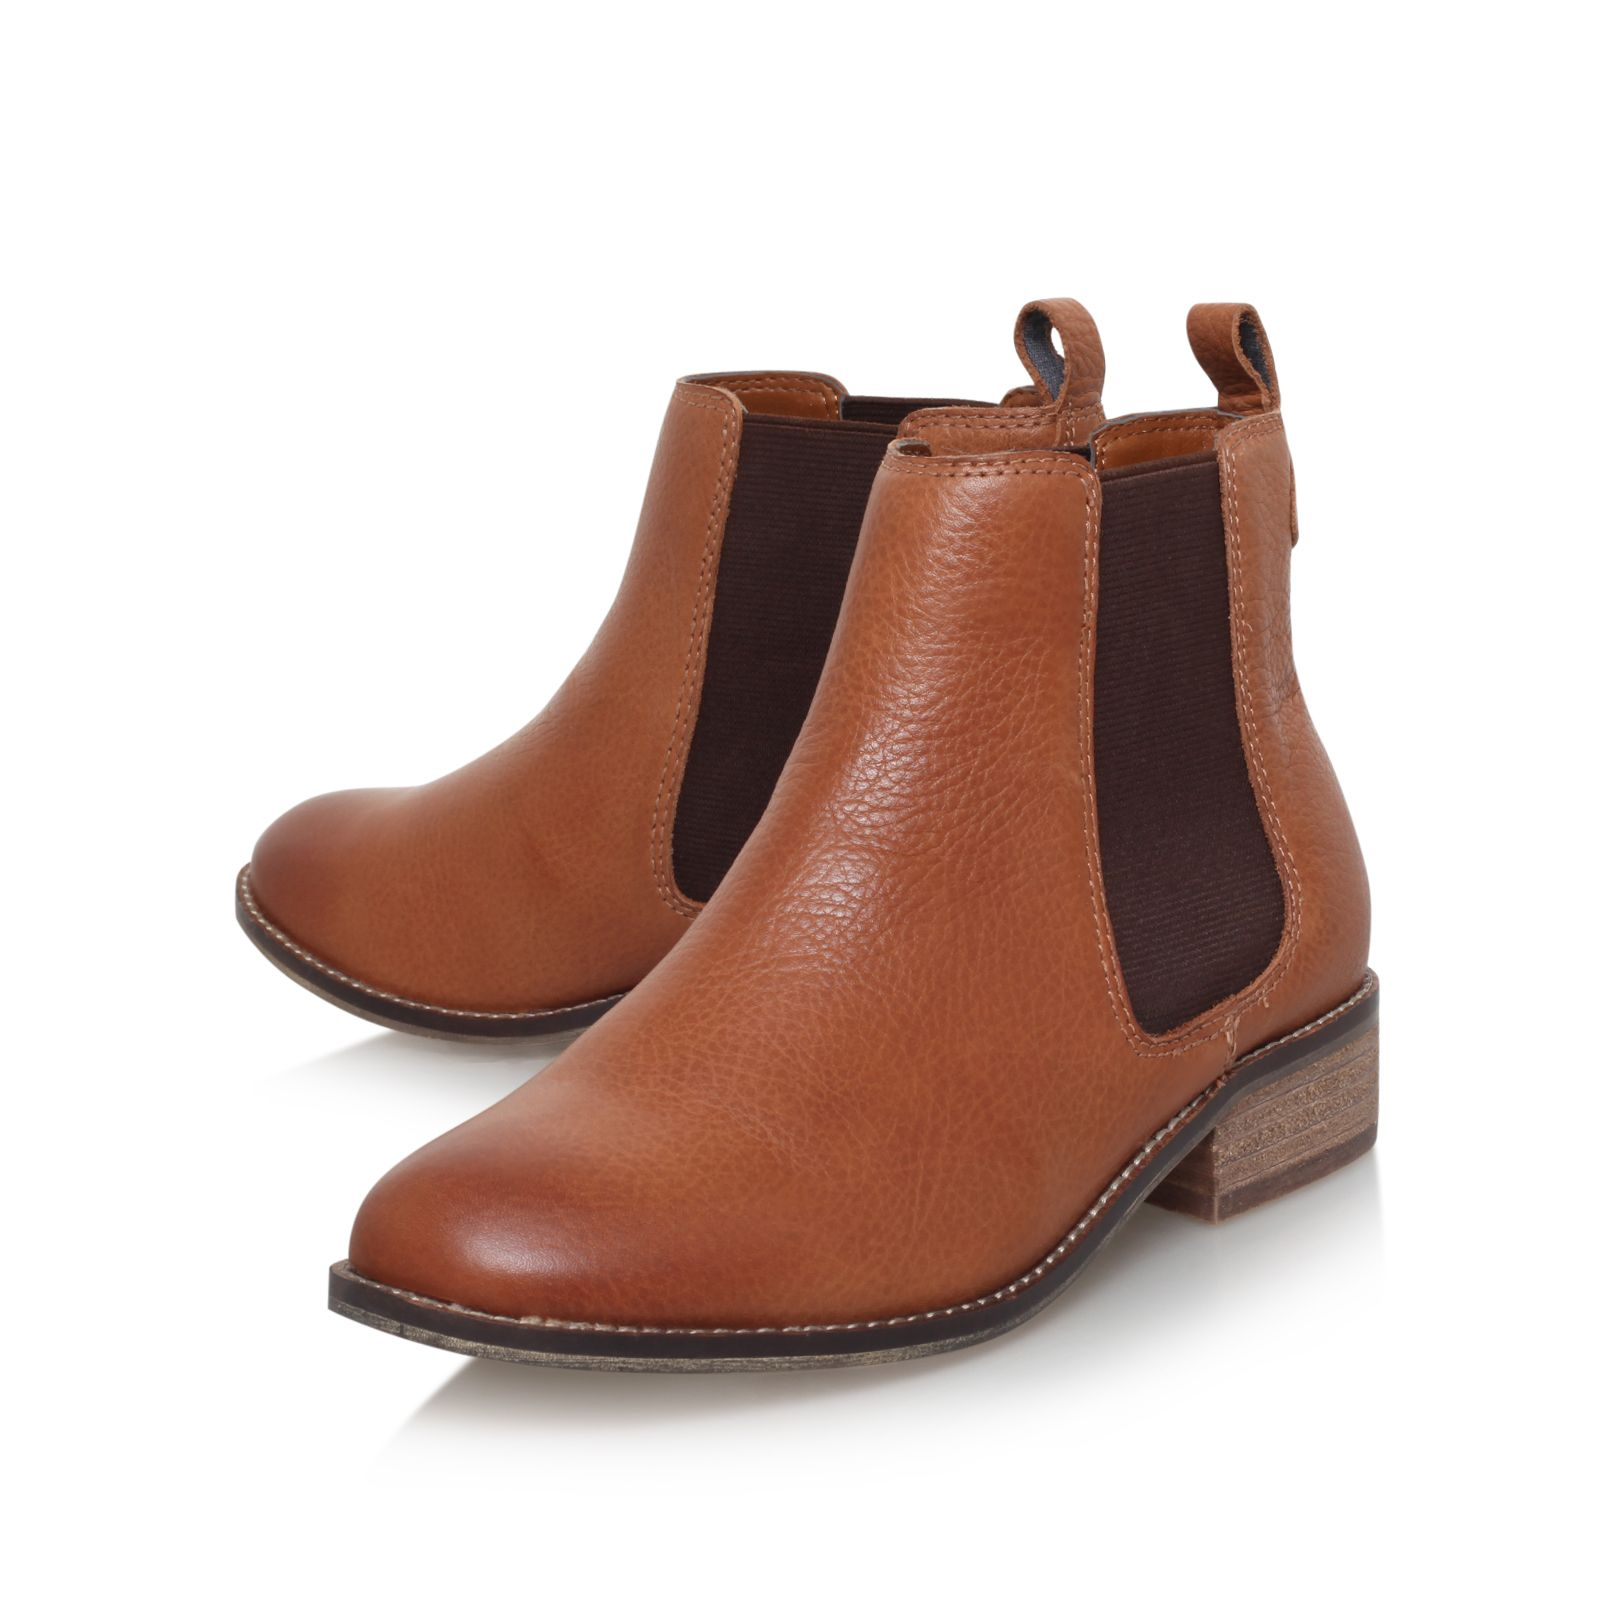 STORM Carvela Storm Tan Leather Flat Ankle Boots by CARVELA KURT GEIGER